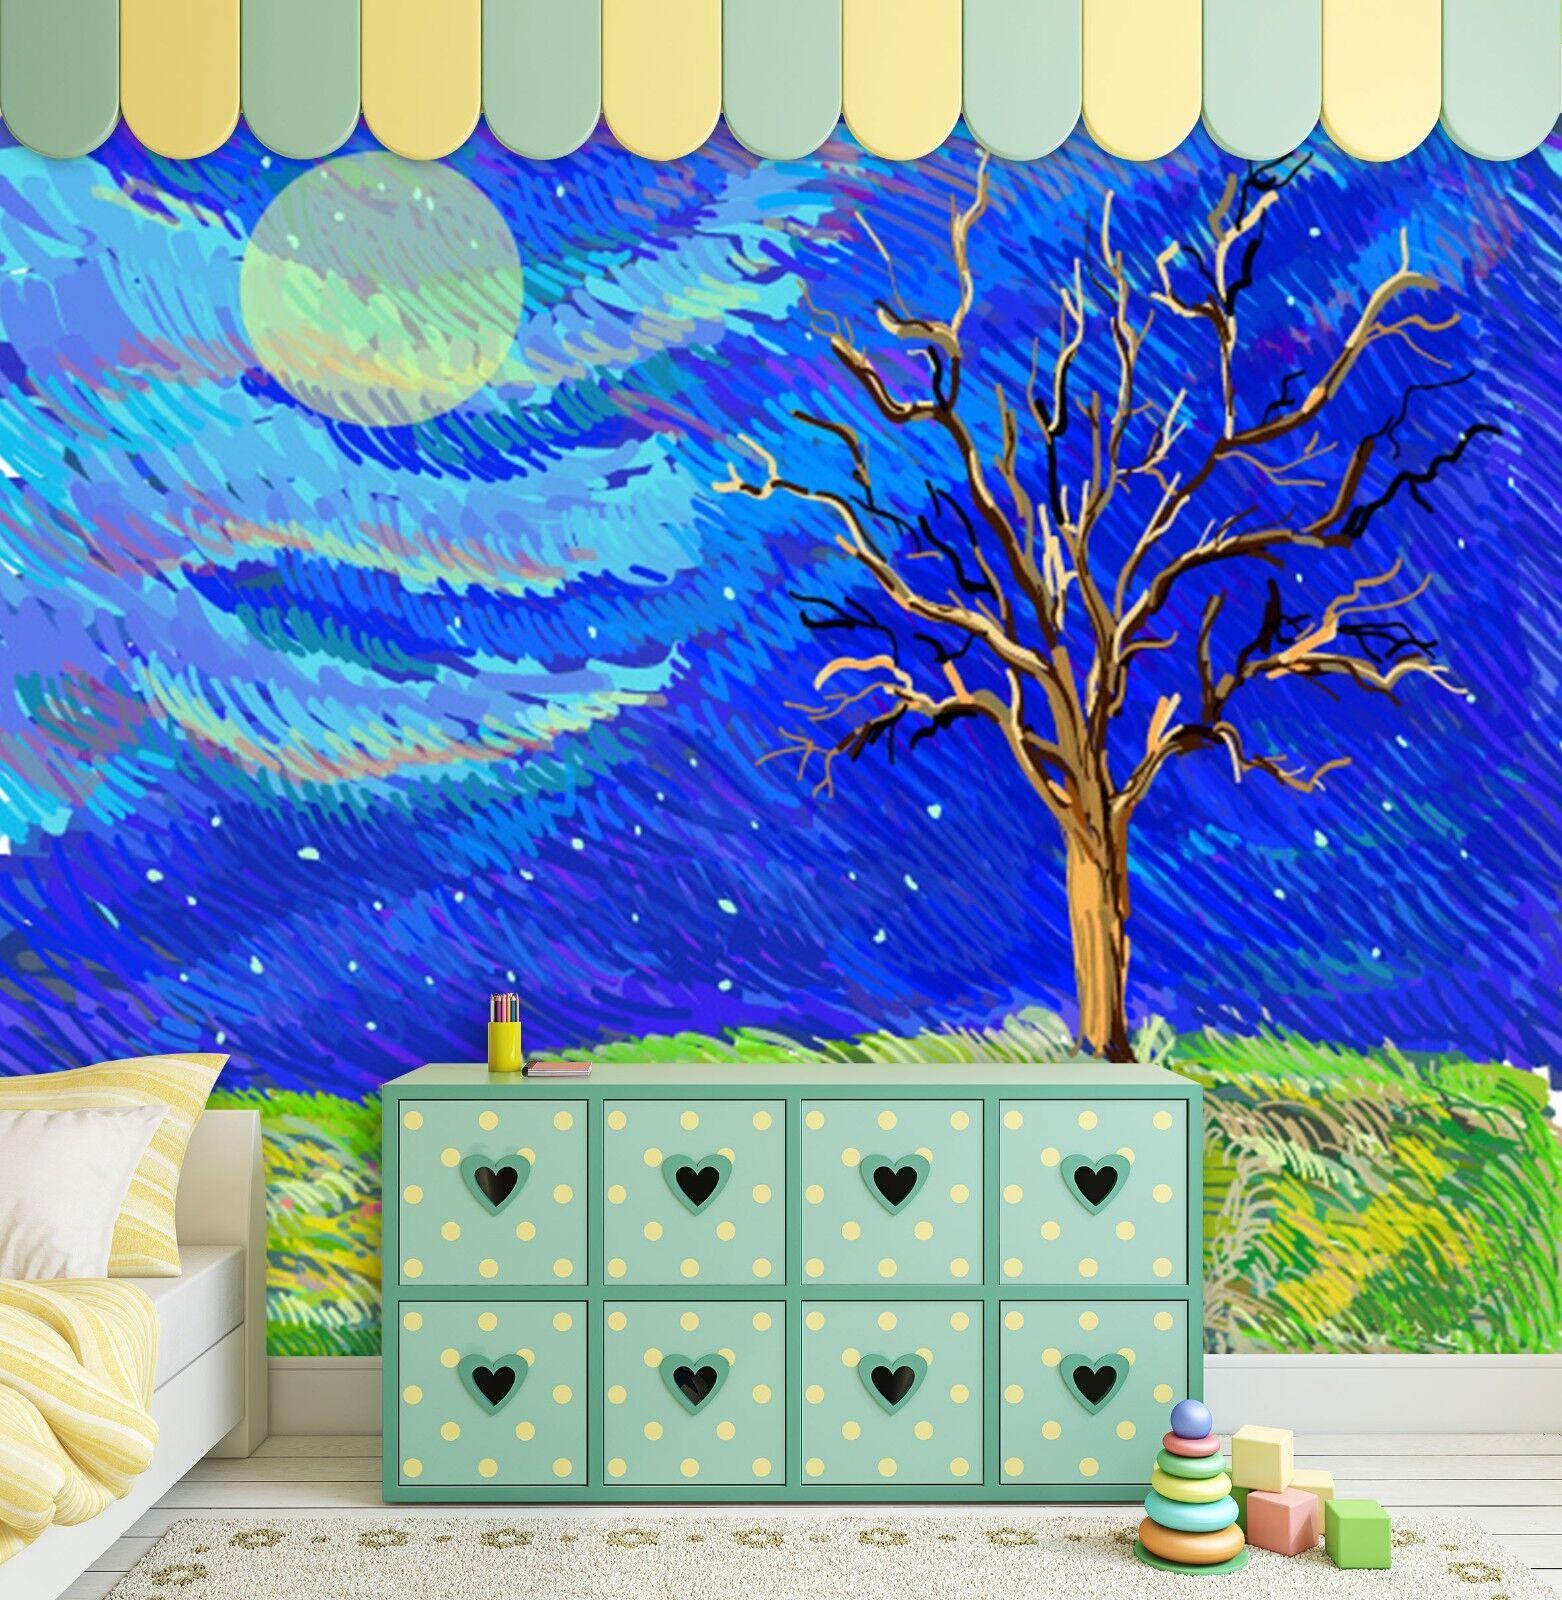 3D Mond Himmel Wiese 898 Tapete Wandgemälde Tapeten Bild Familie DE Lemon  | Fairer Preis  | Zuverlässige Leistung  | Primäre Qualität